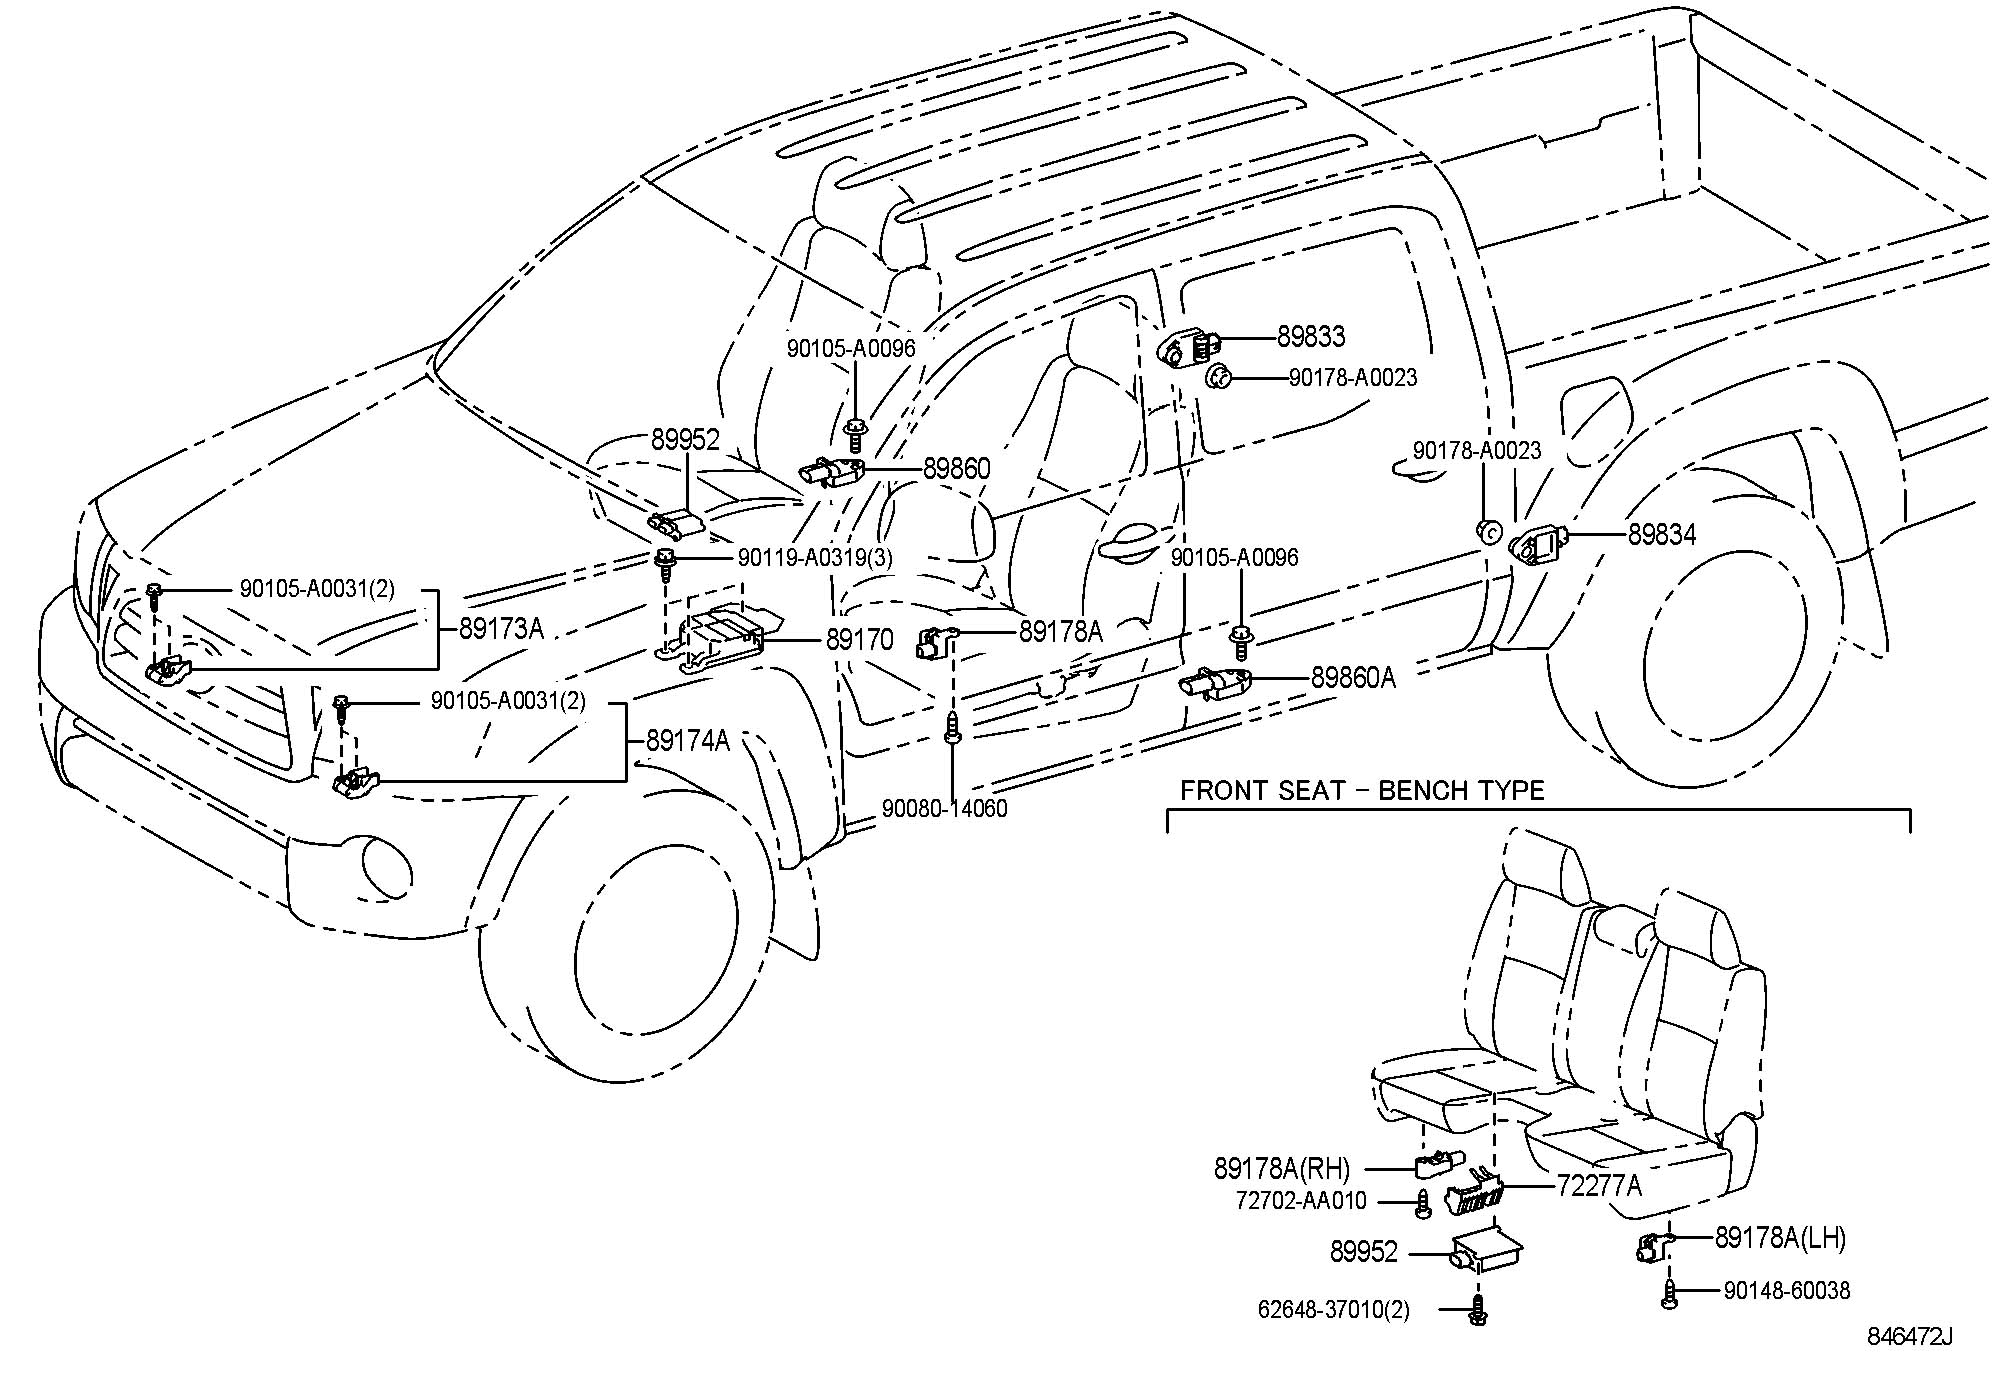 2005 Toyota Tacoma Sensor, seat position air bag. Sensor